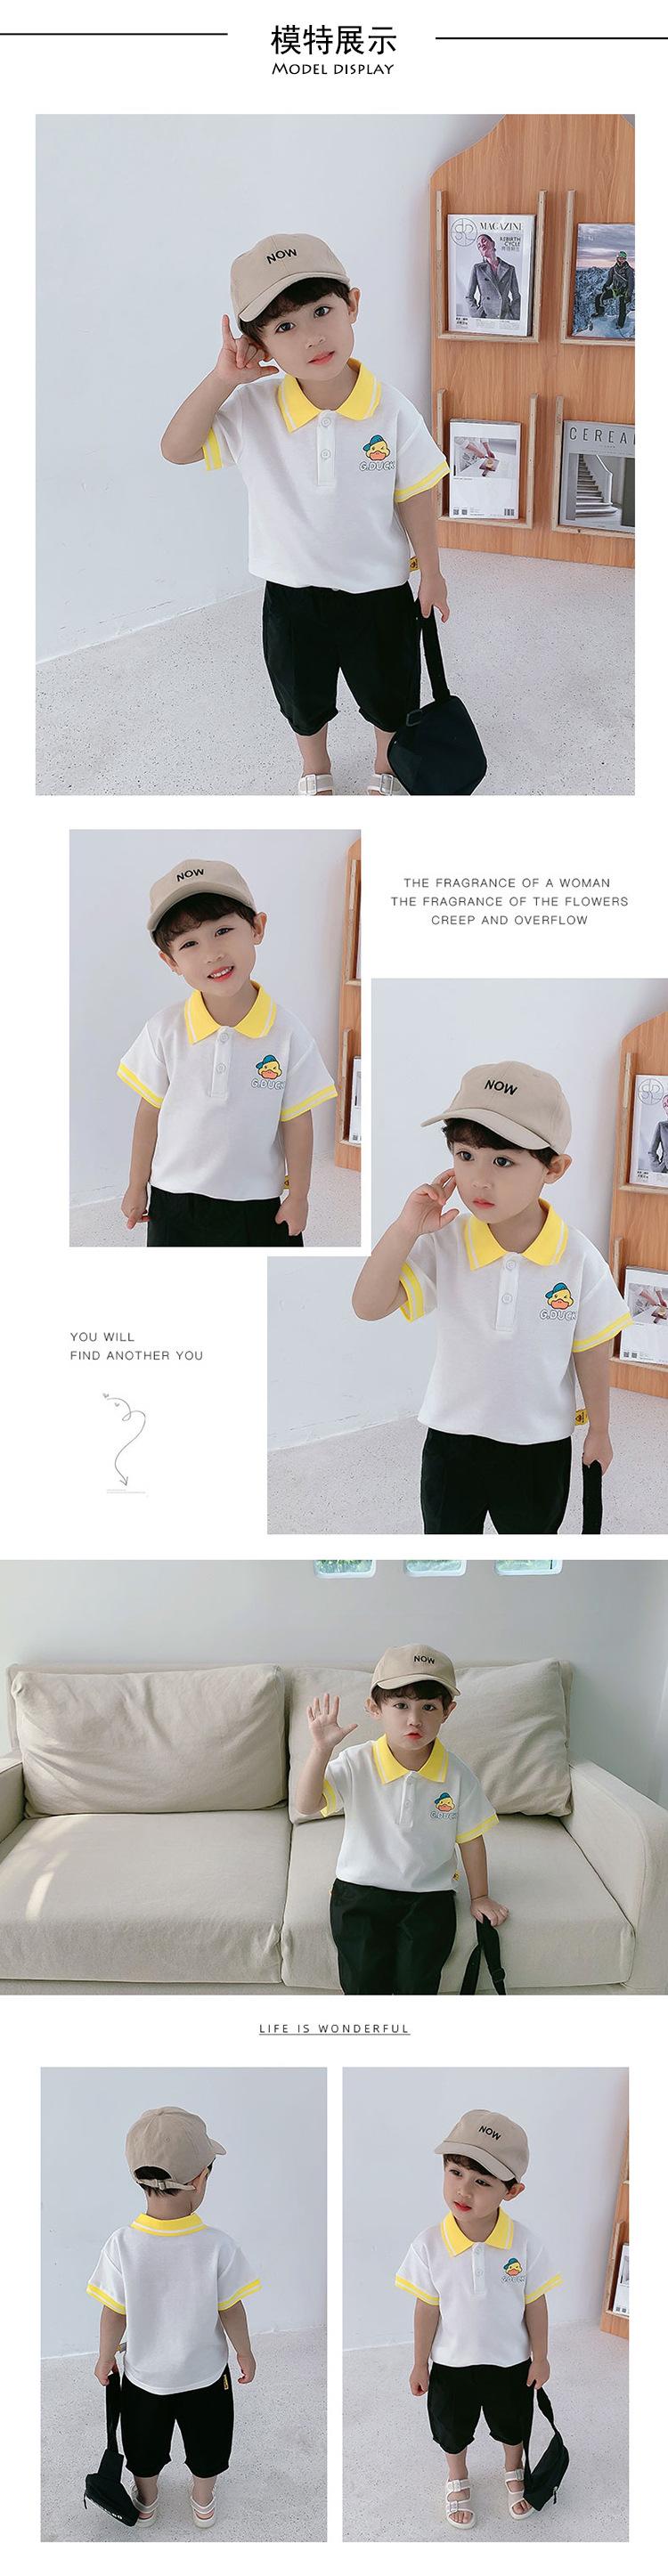 YK8耀客小卡通T恤 儿童短袖T恤新款夏装男童 黑色 款号:xg-9055